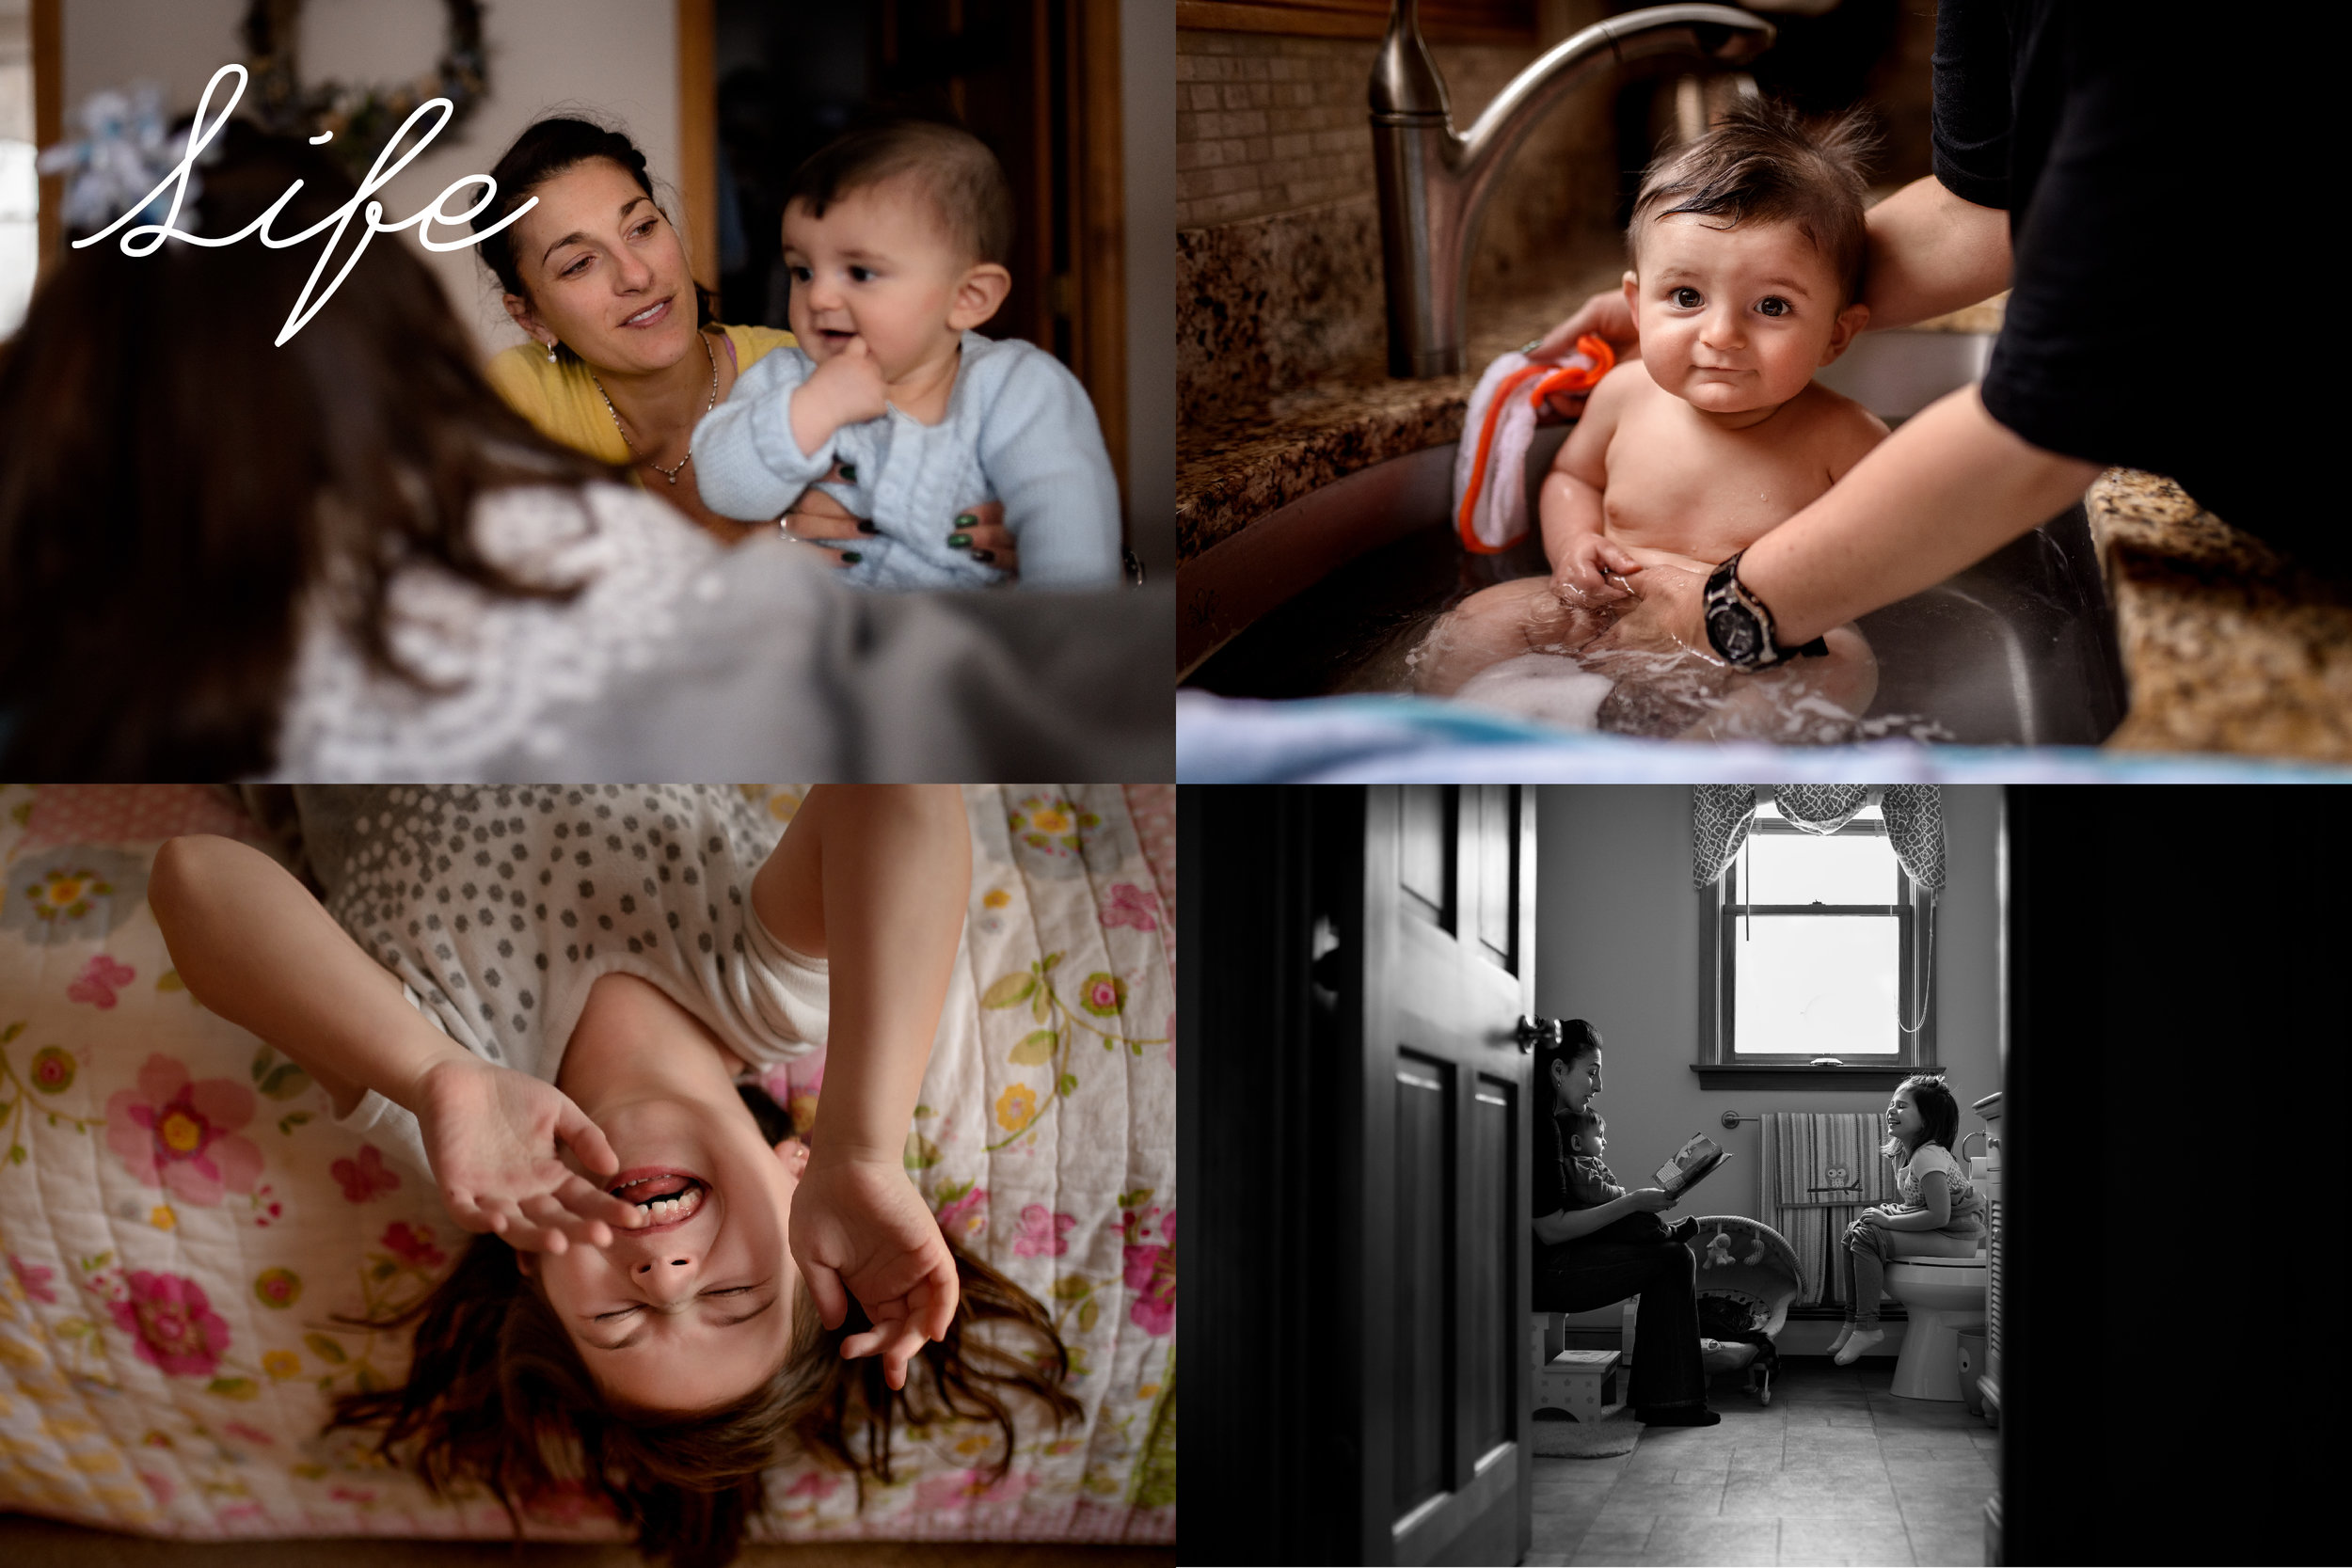 SQSP Motherhood Tara Click-Thru Image-01.jpg